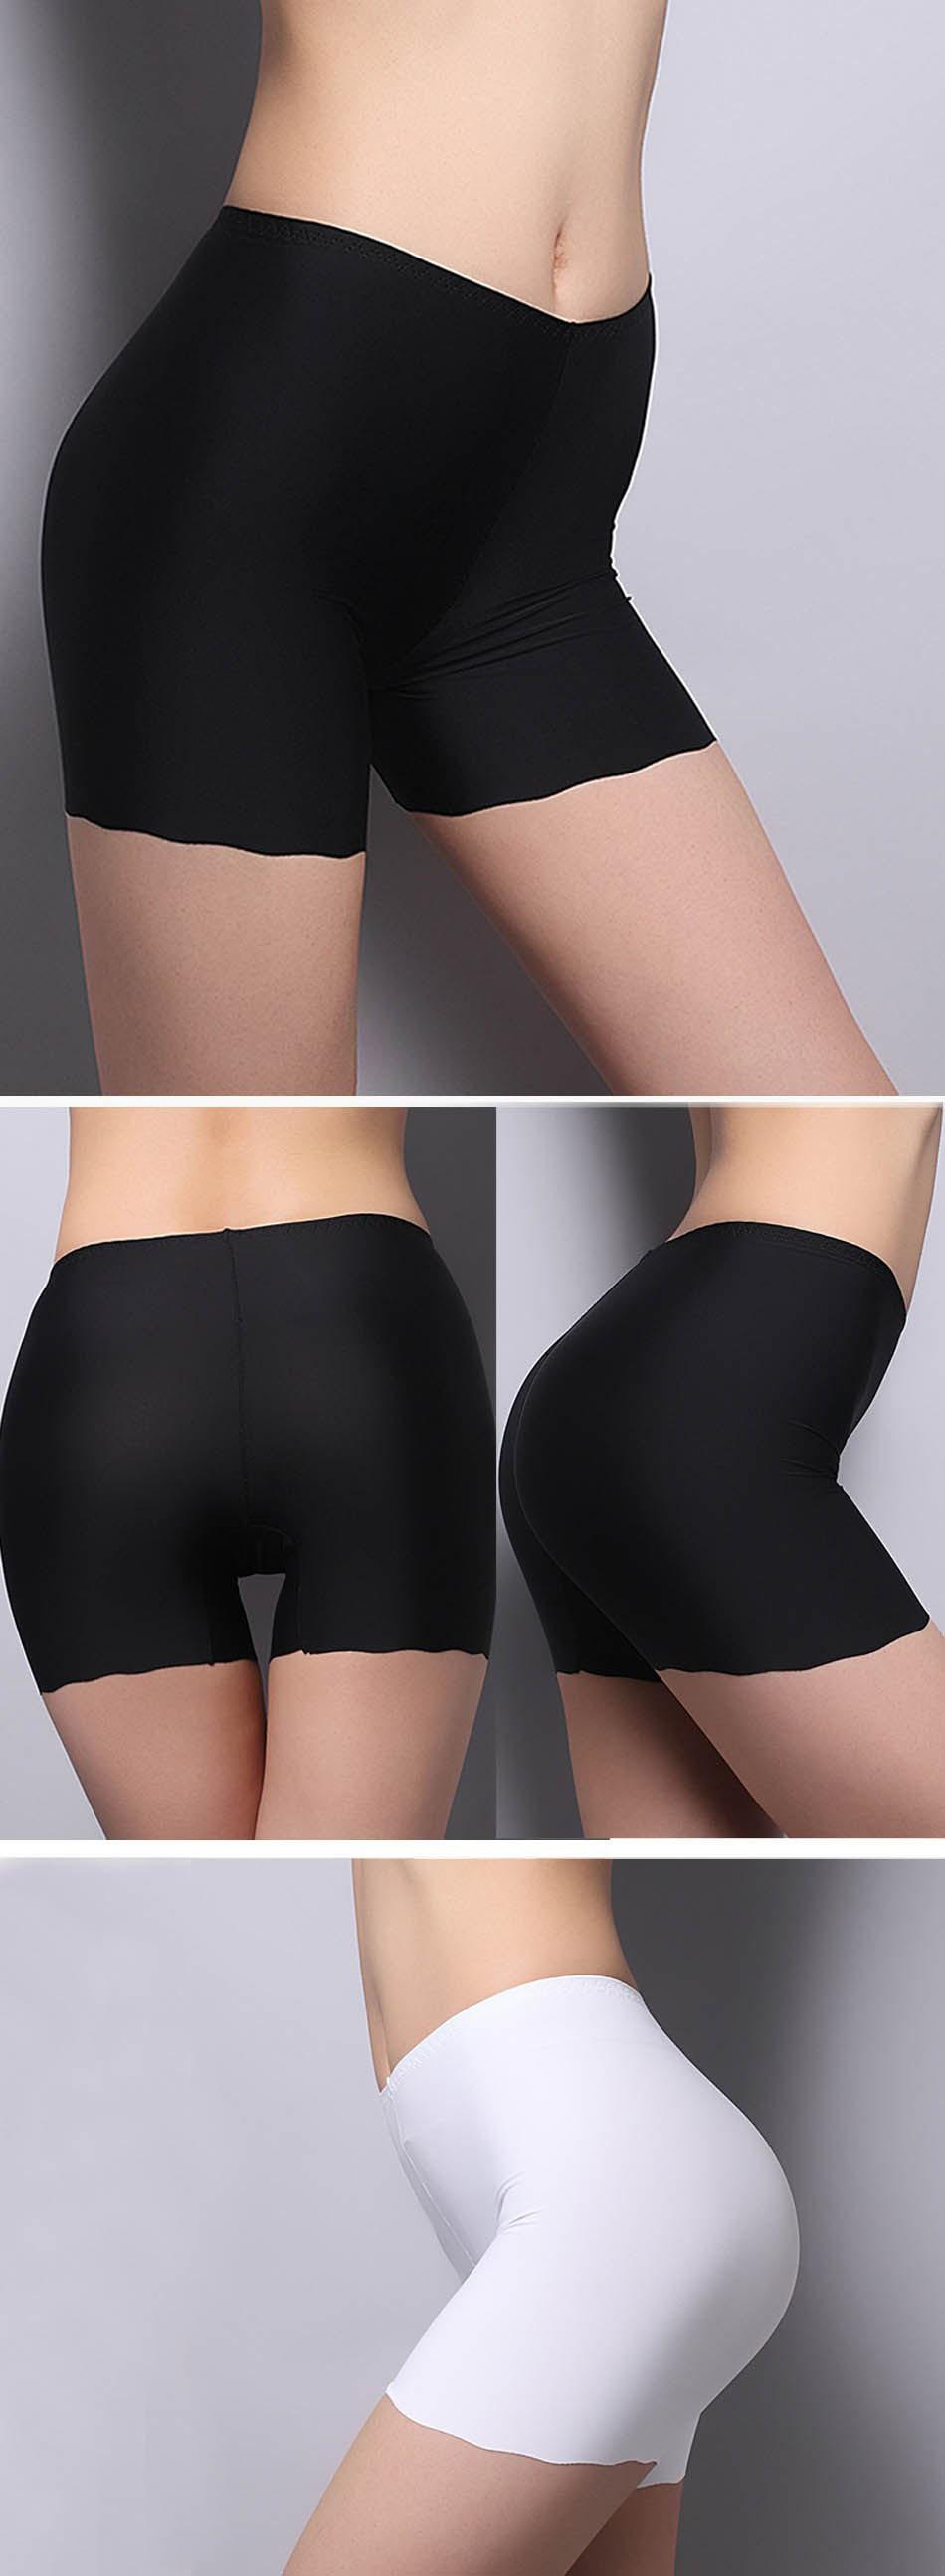 New 2017 Women Safety Shorts Female Seamless Legging Pants Casual Women's Summer Briefs Ice Silk Underwear Boxer 10